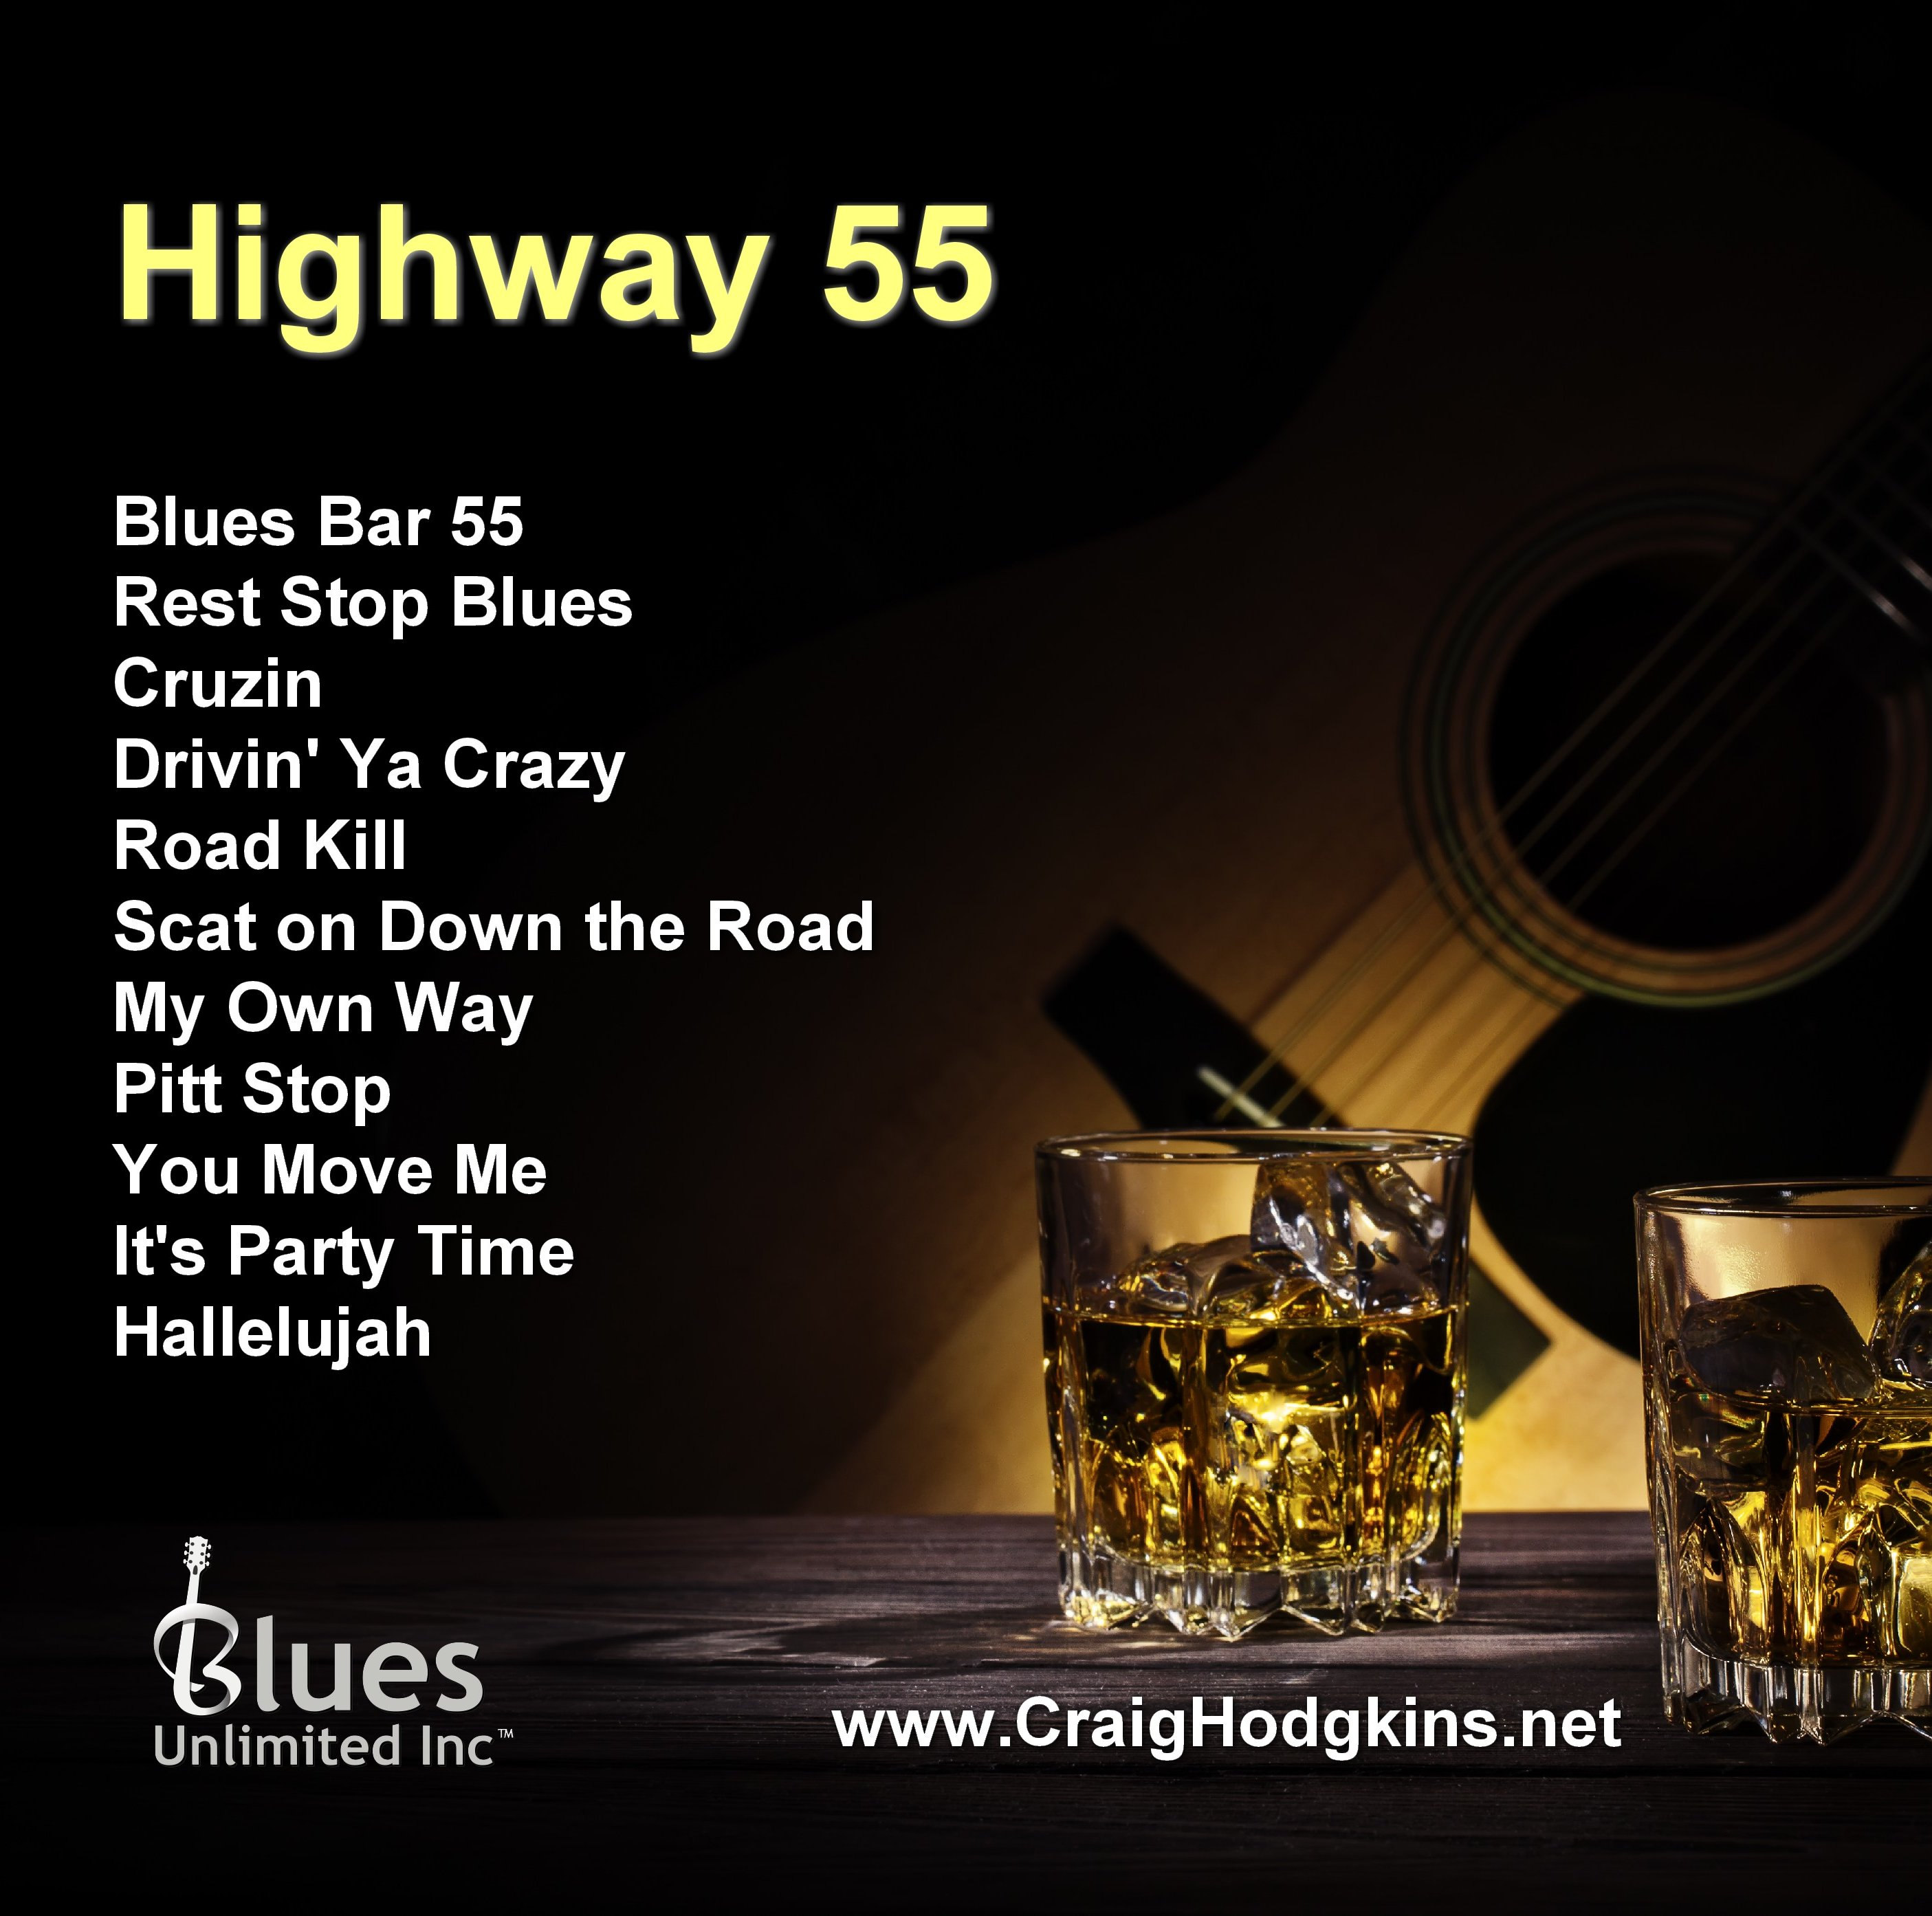 Hwy 55 Near Me >> Highway 55 Craig Hodgkins